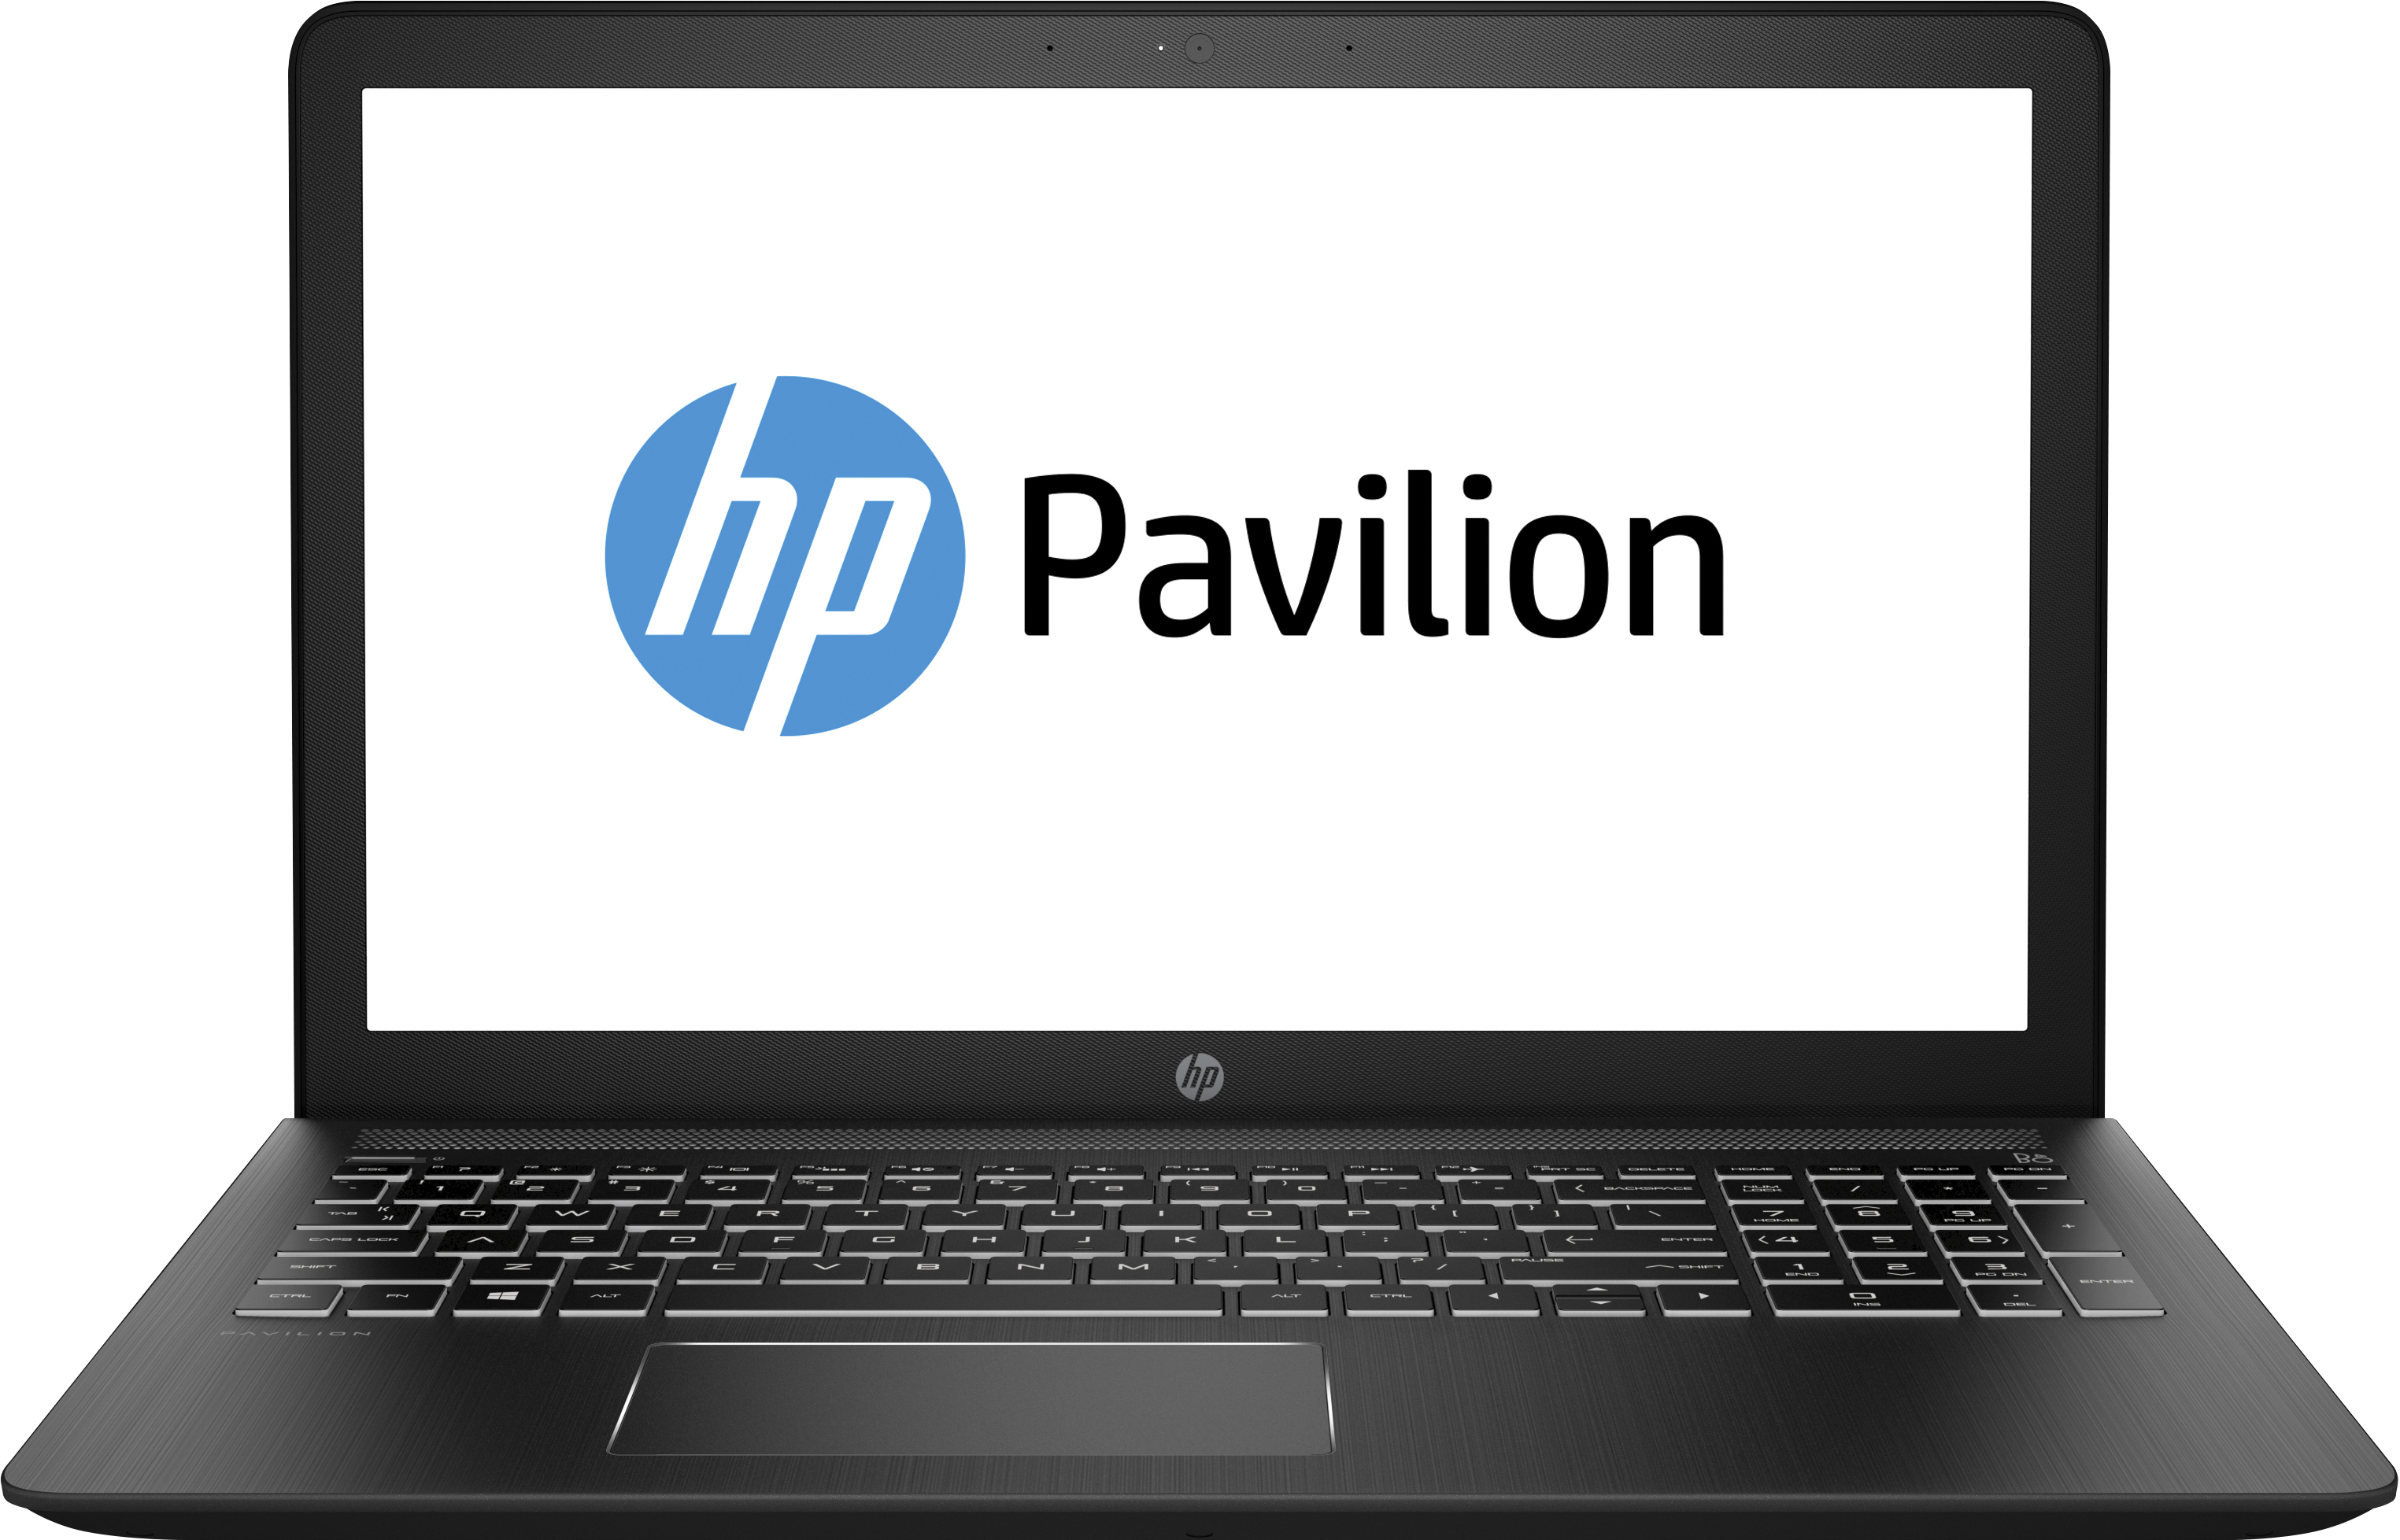 "HP Pavilion Power 15-cb023nf 2.5GHz i5-7300HQ 15.6"" 1920 x 1080Pixel Nero, Bianco Computer portatile"